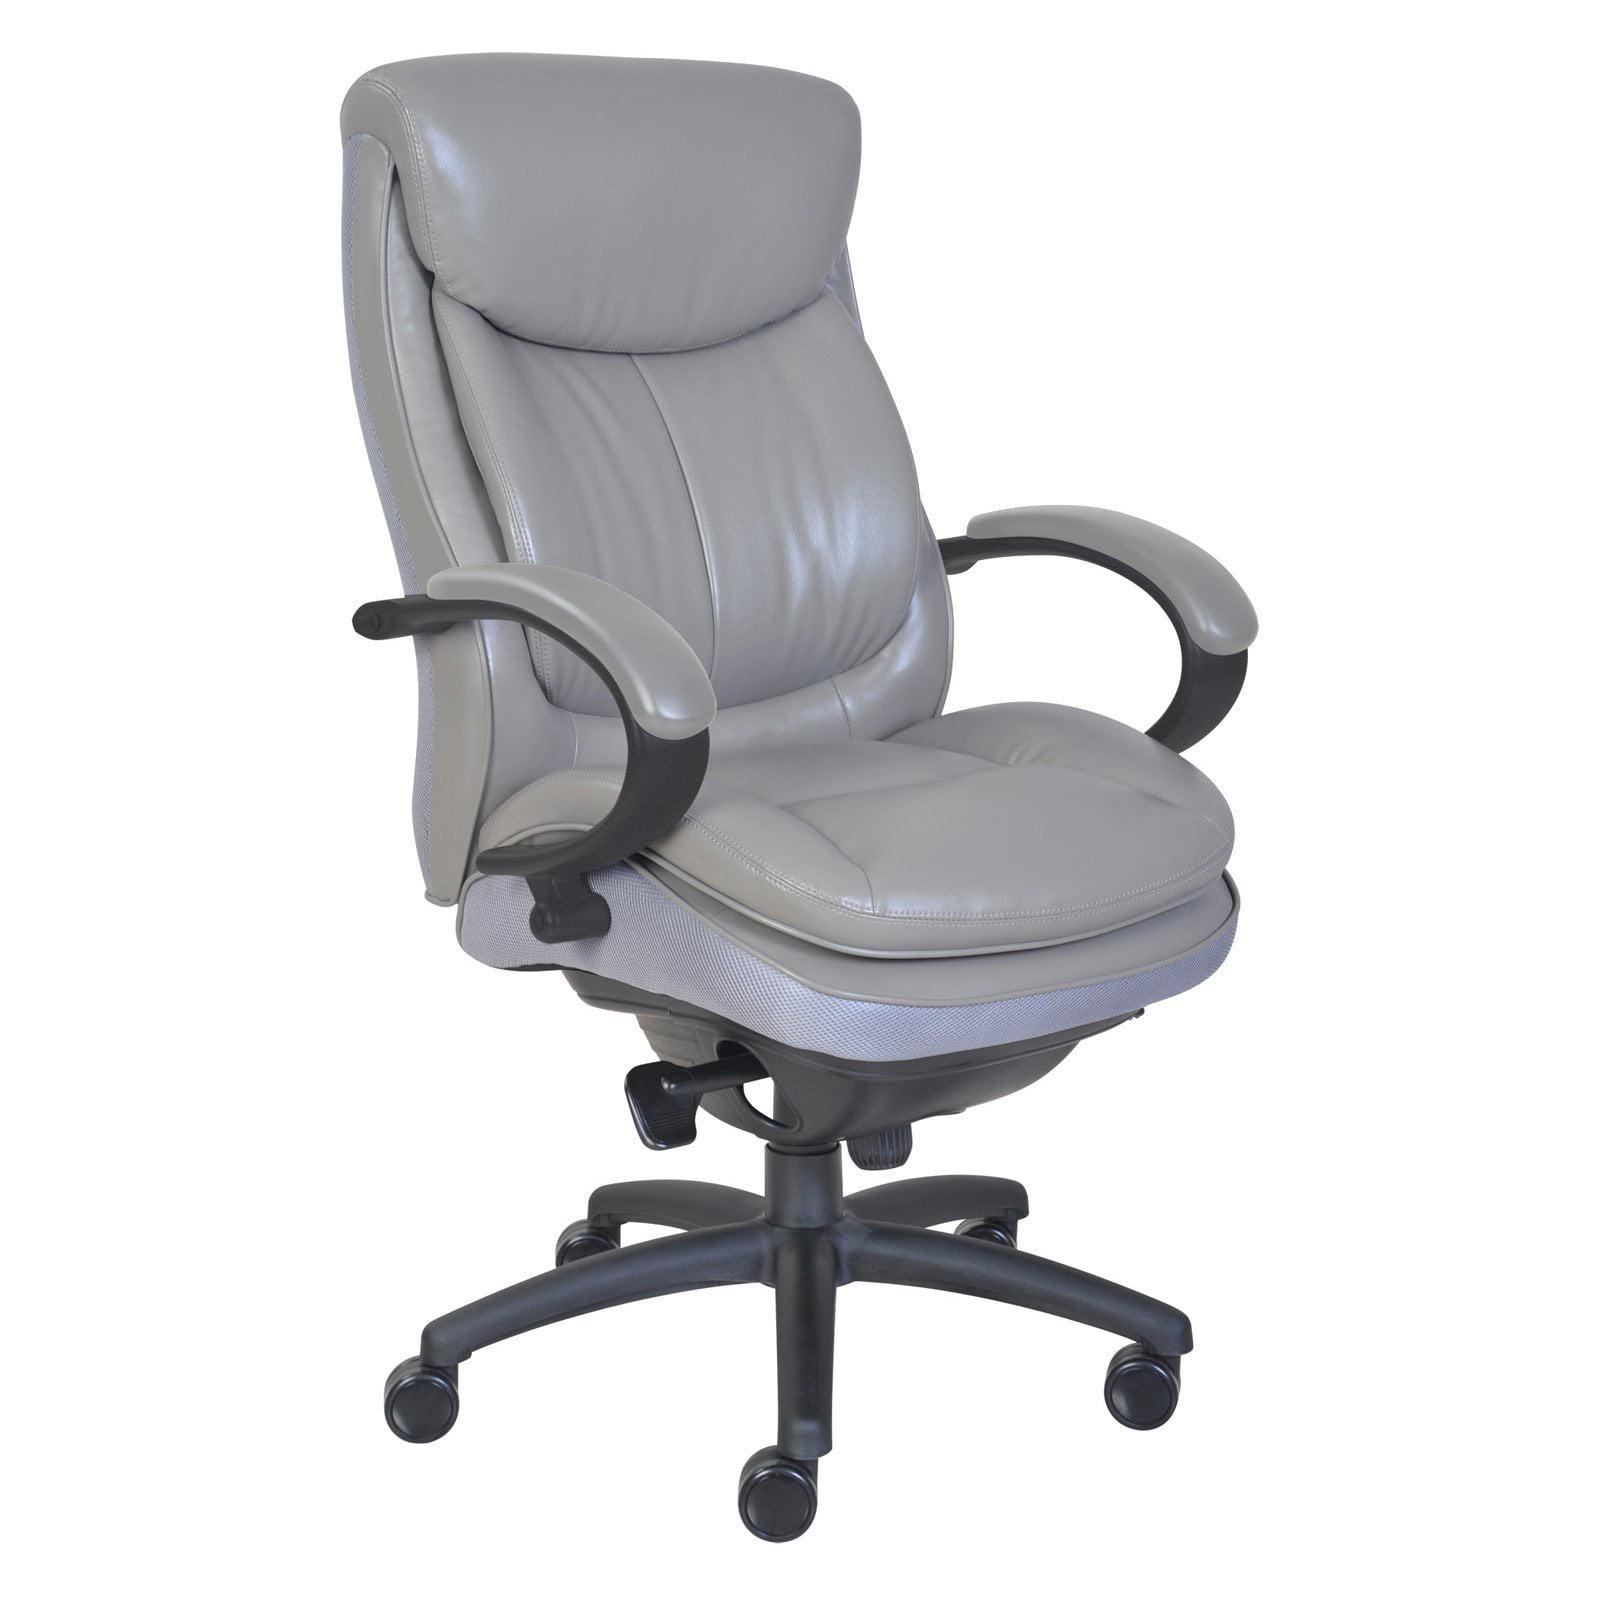 Picture of: Serta 300 Series Executive Desk Chair Walmart Inventory Checker Brickseek